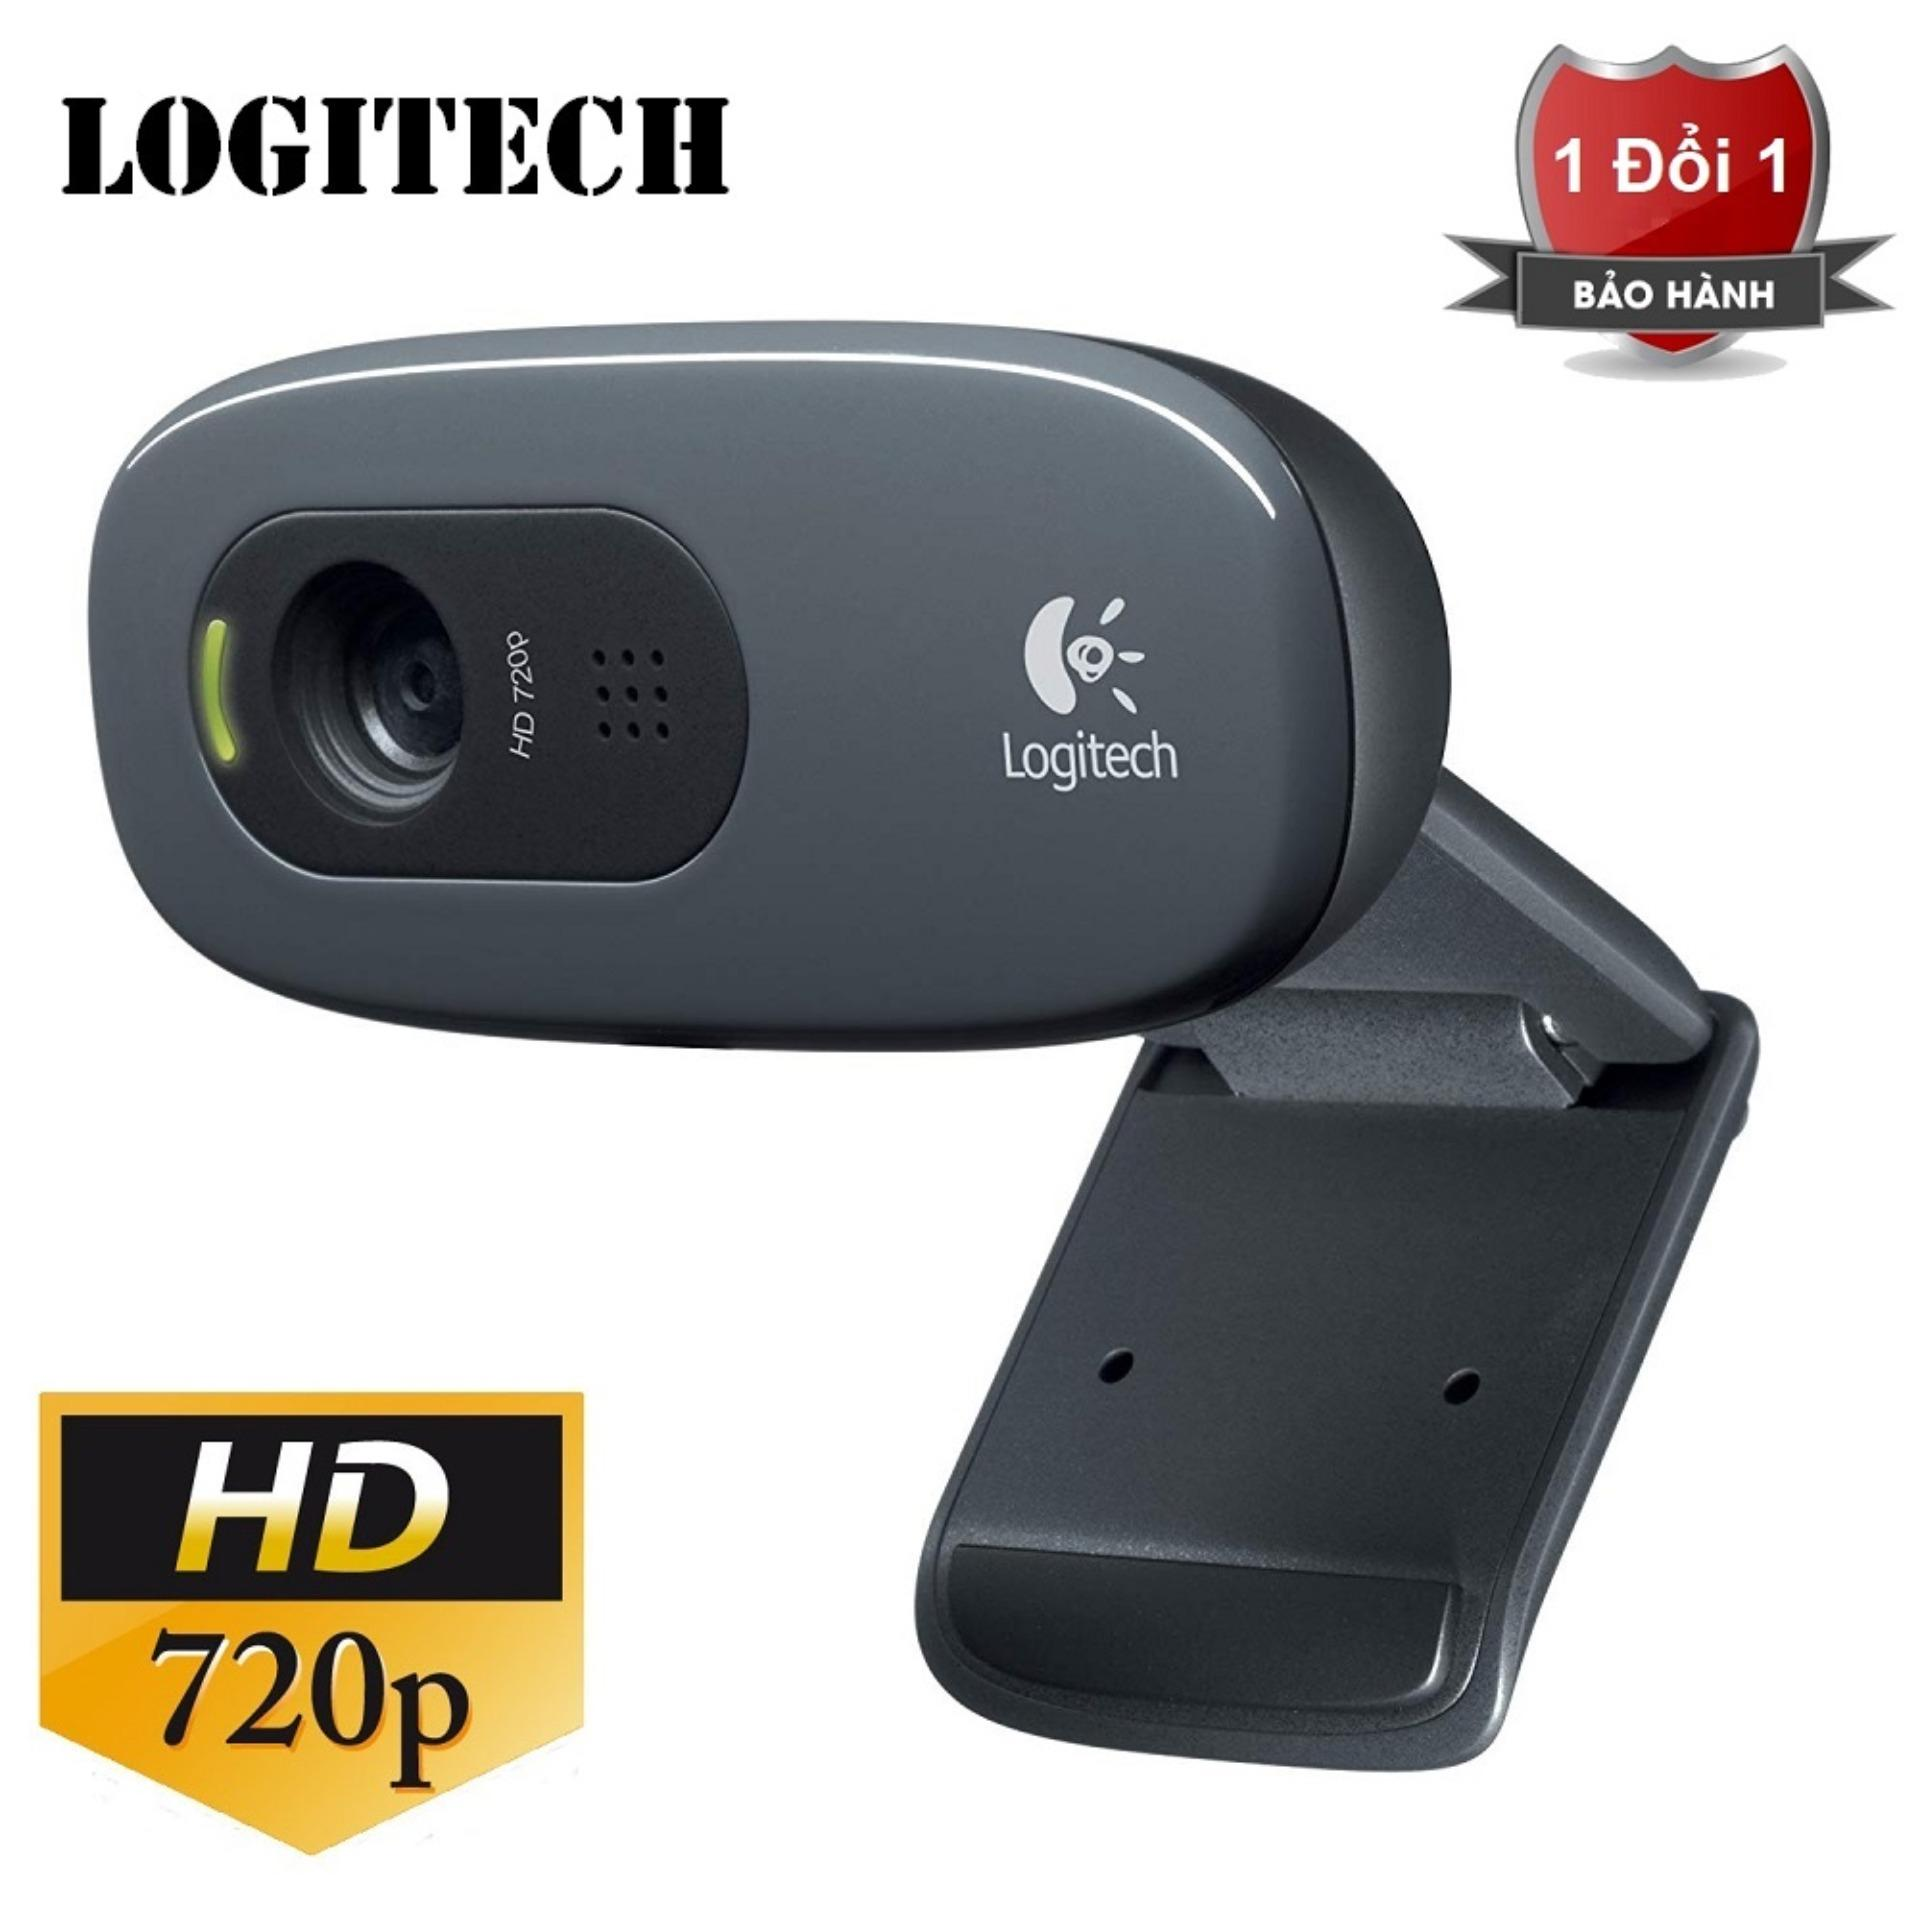 Hình ảnh Webcam Logitech HD C270